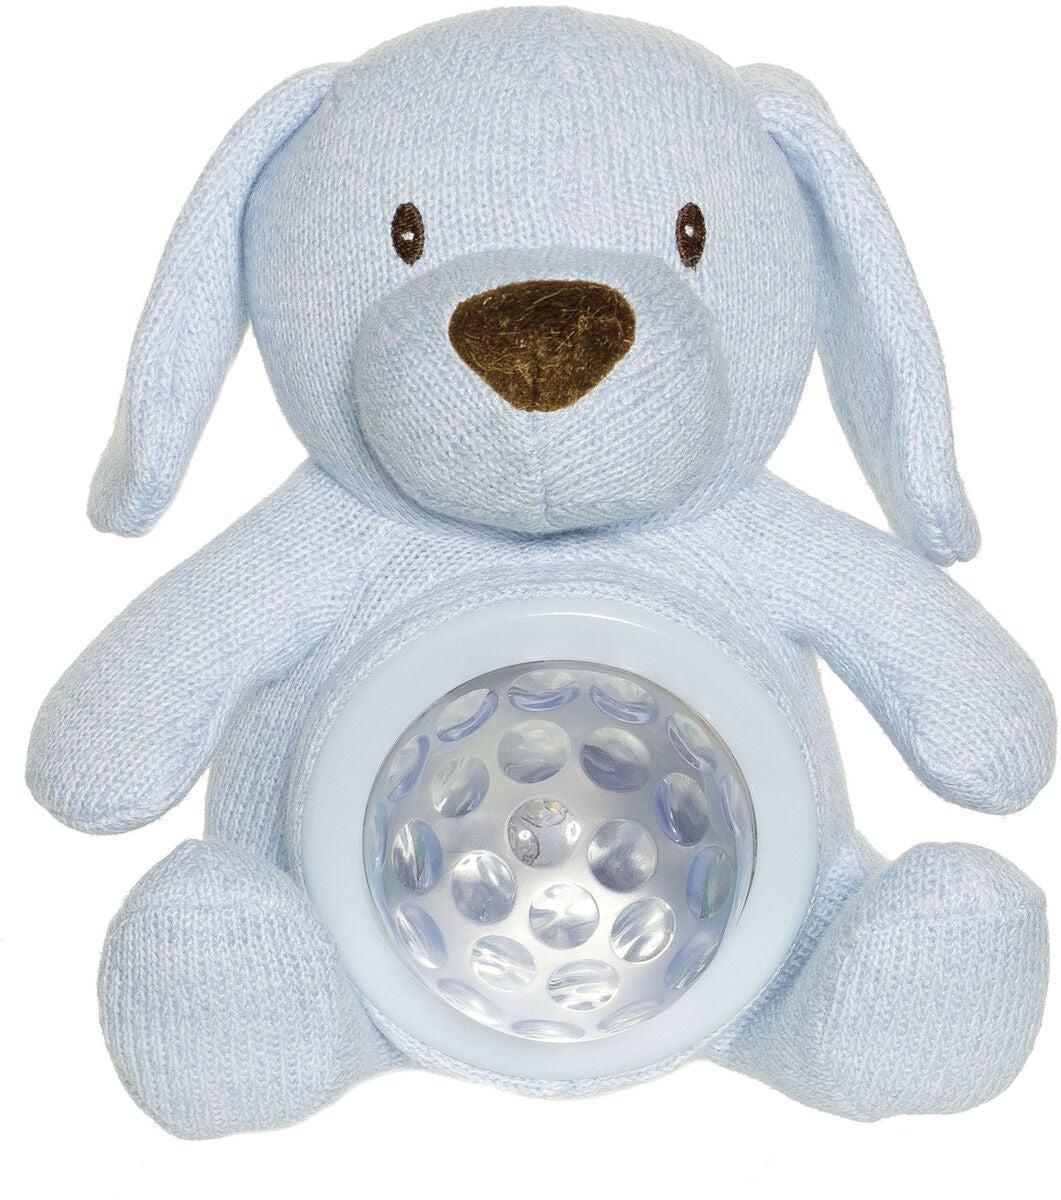 Kjøp Teddykompaniet Nattlampe Ugle | Jollyroom